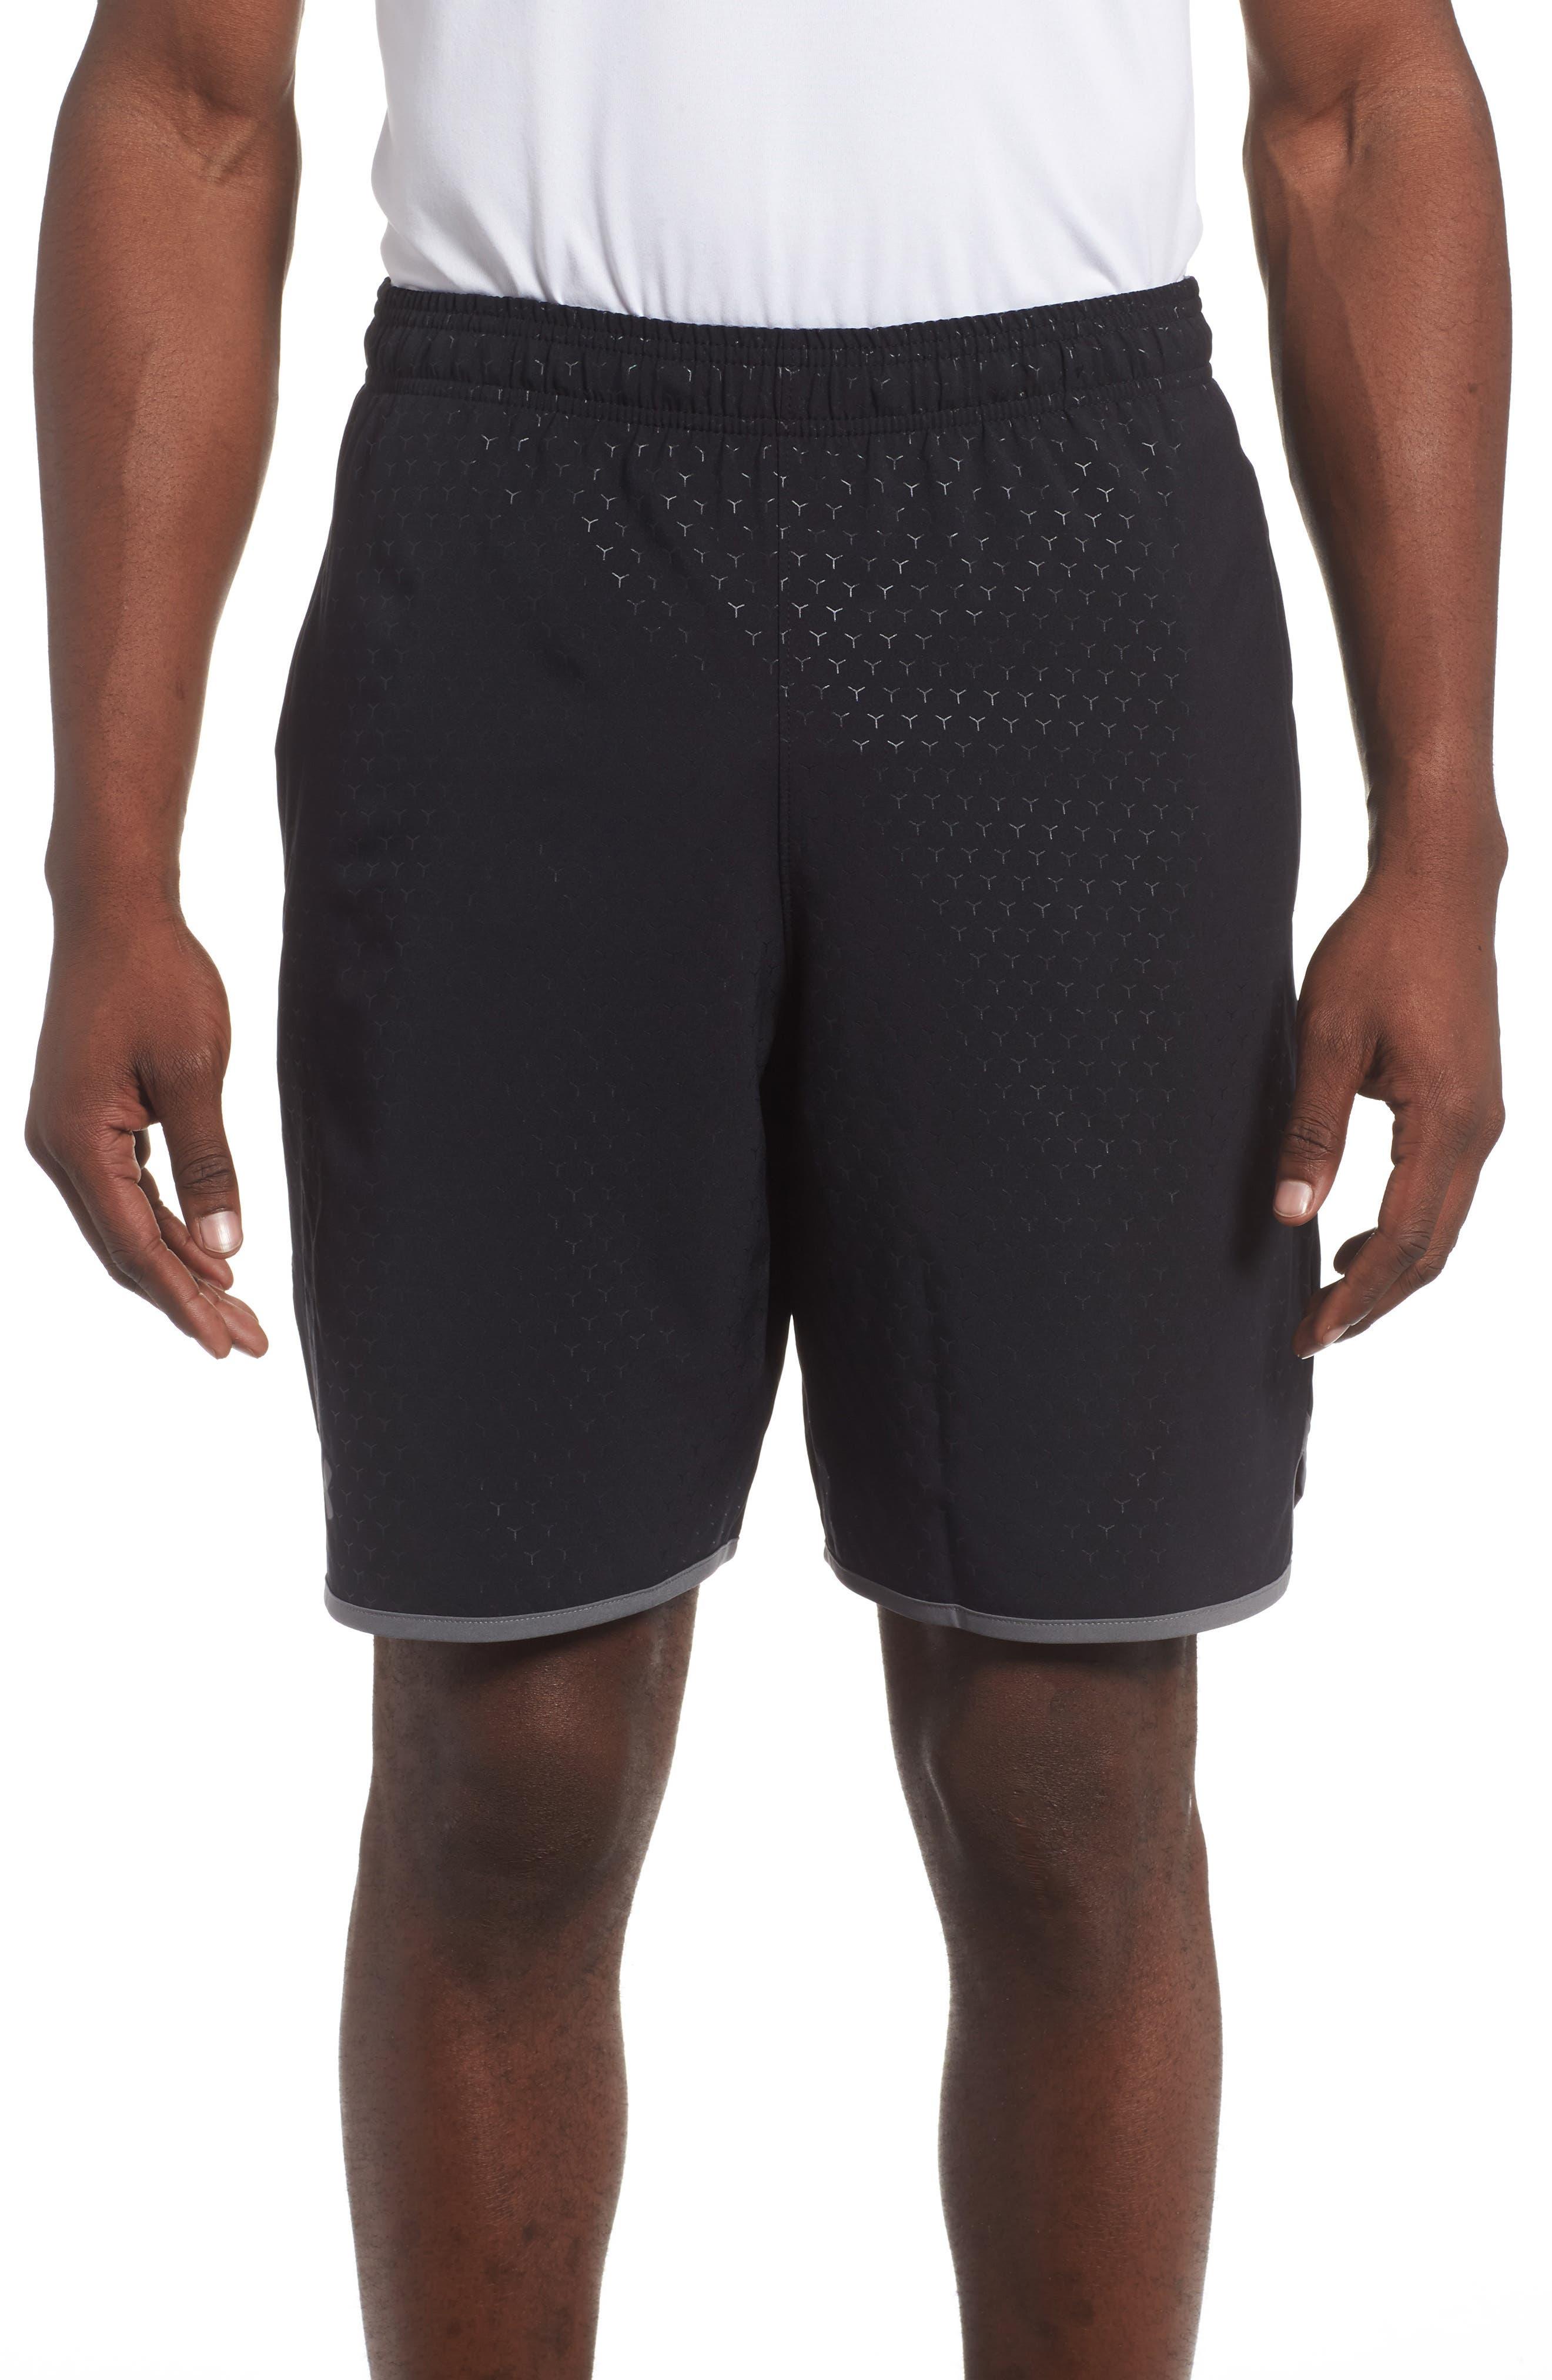 Qualifier Training Shorts,                             Main thumbnail 1, color,